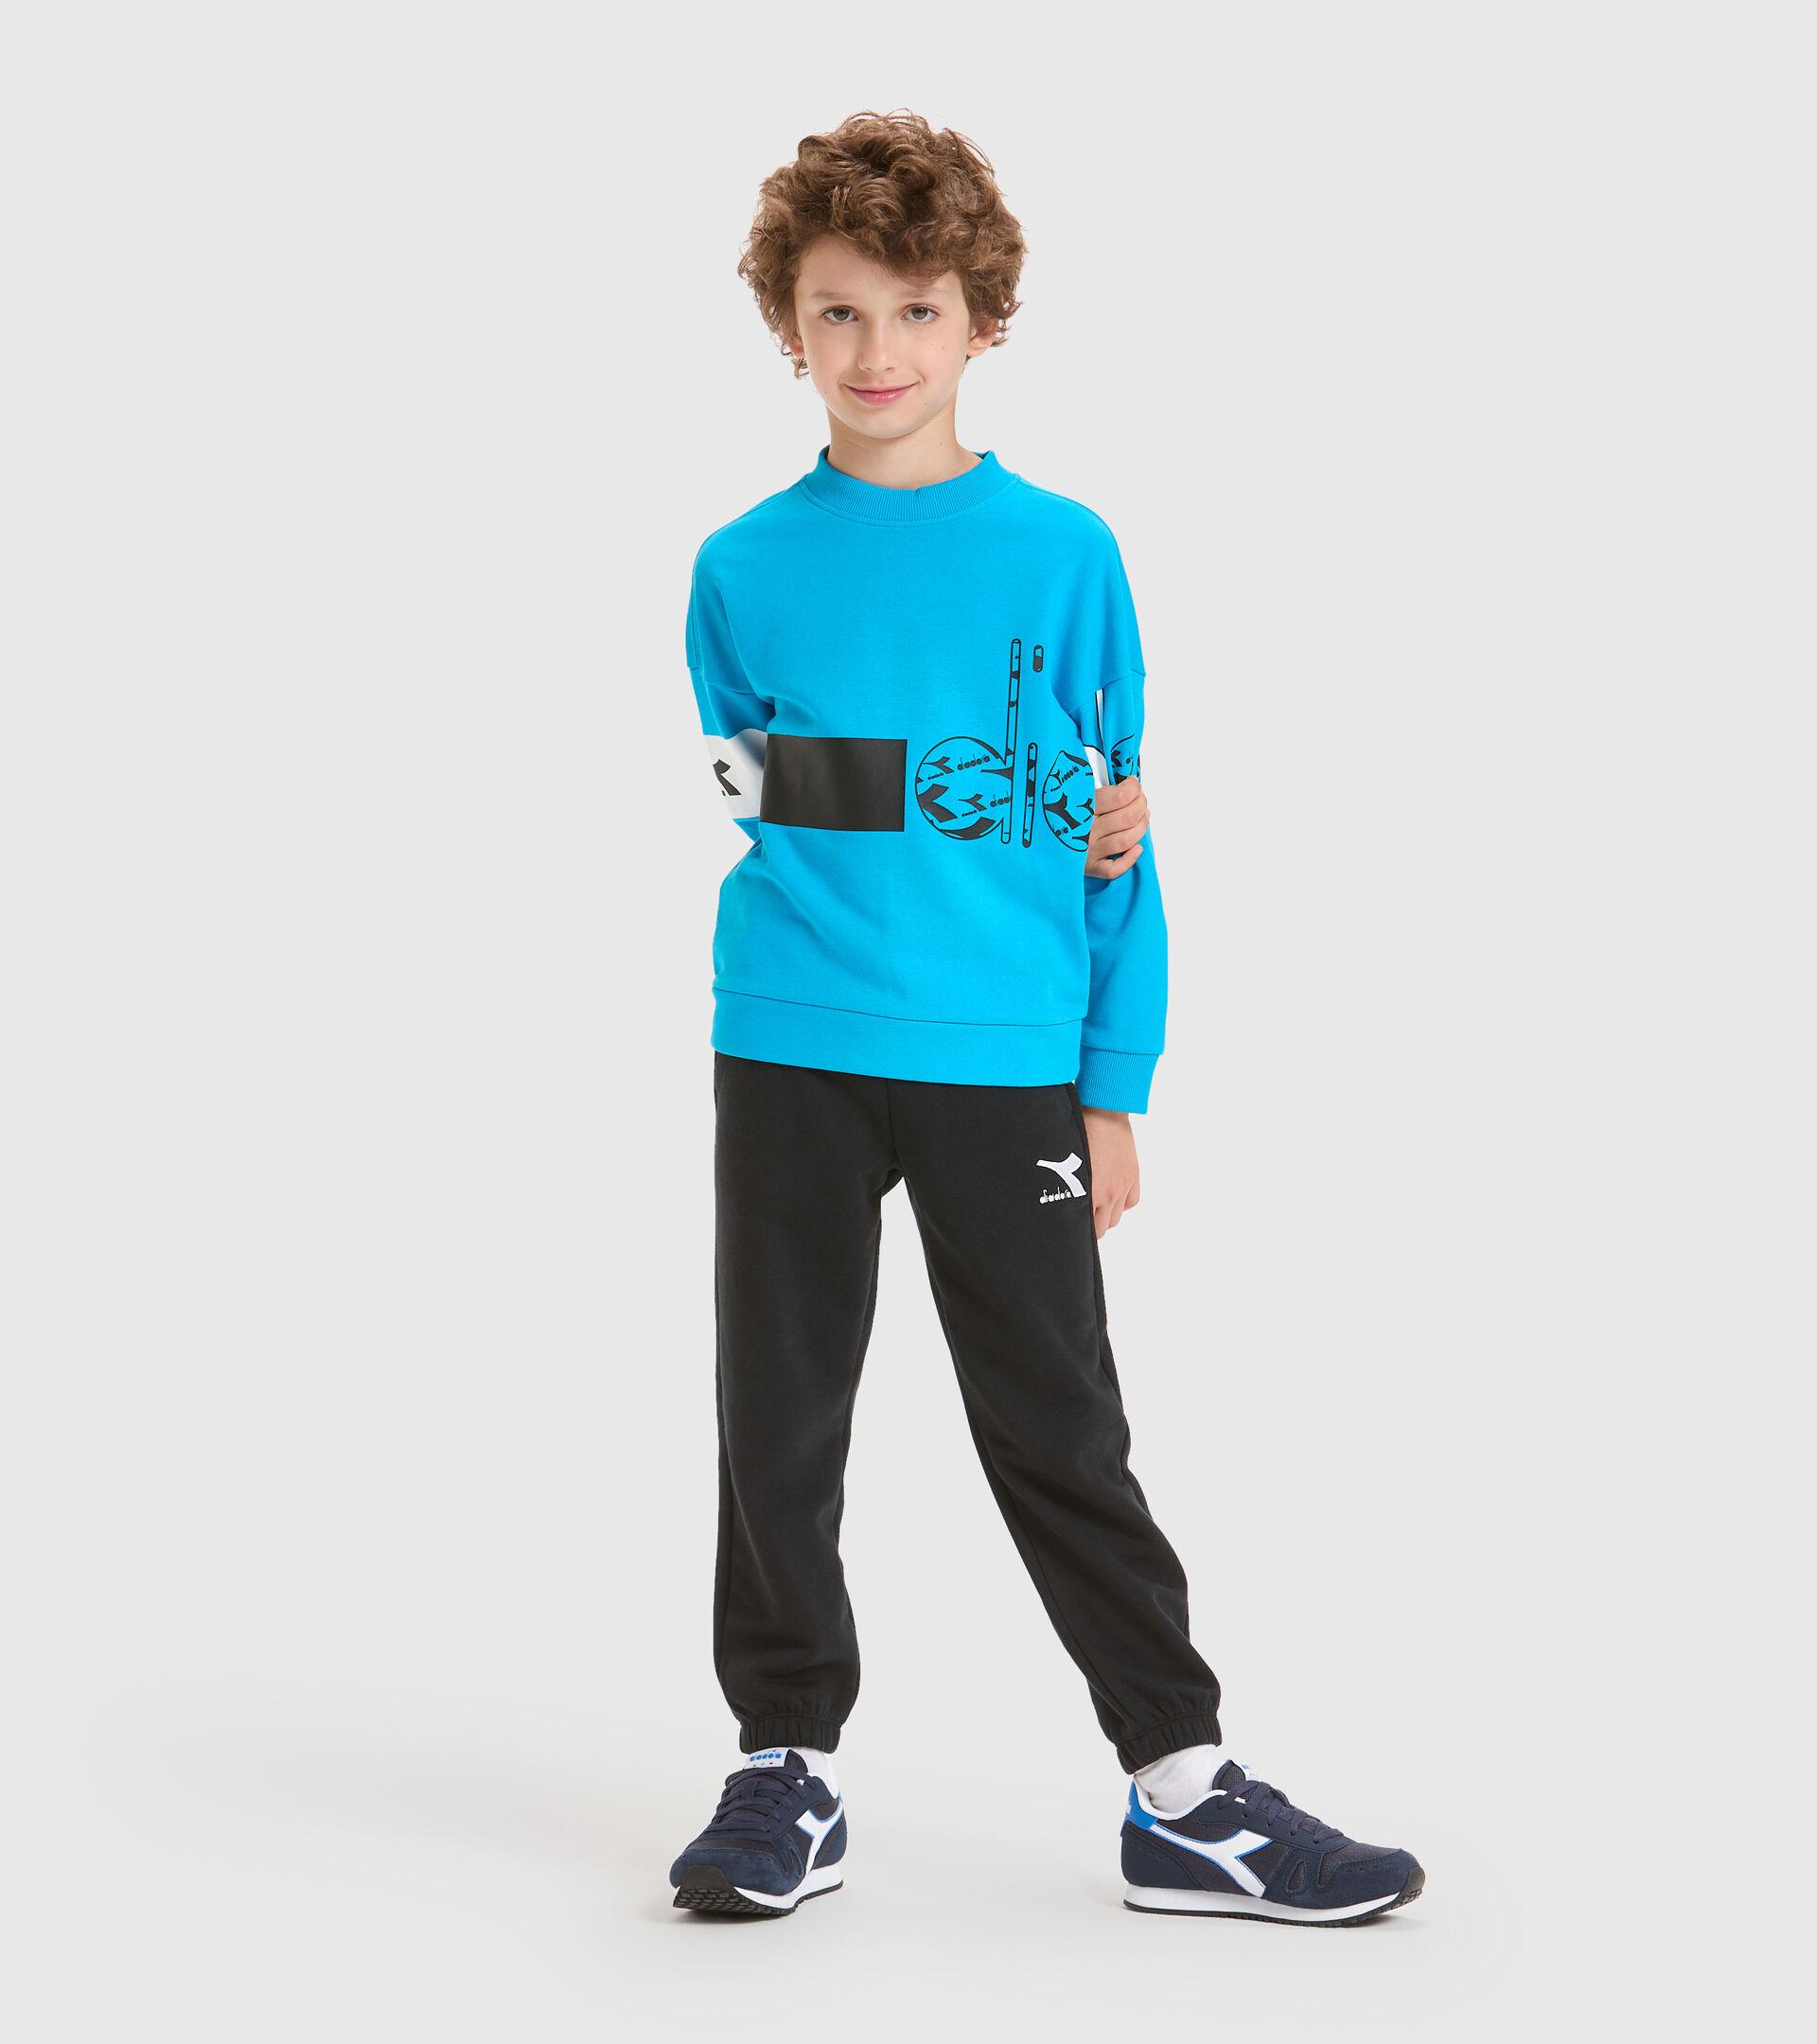 Crew-neck sweatshirt - Kids JB.SWEATSHIRT CREW HOOPLA SKY-BLUE DANUBE - Diadora